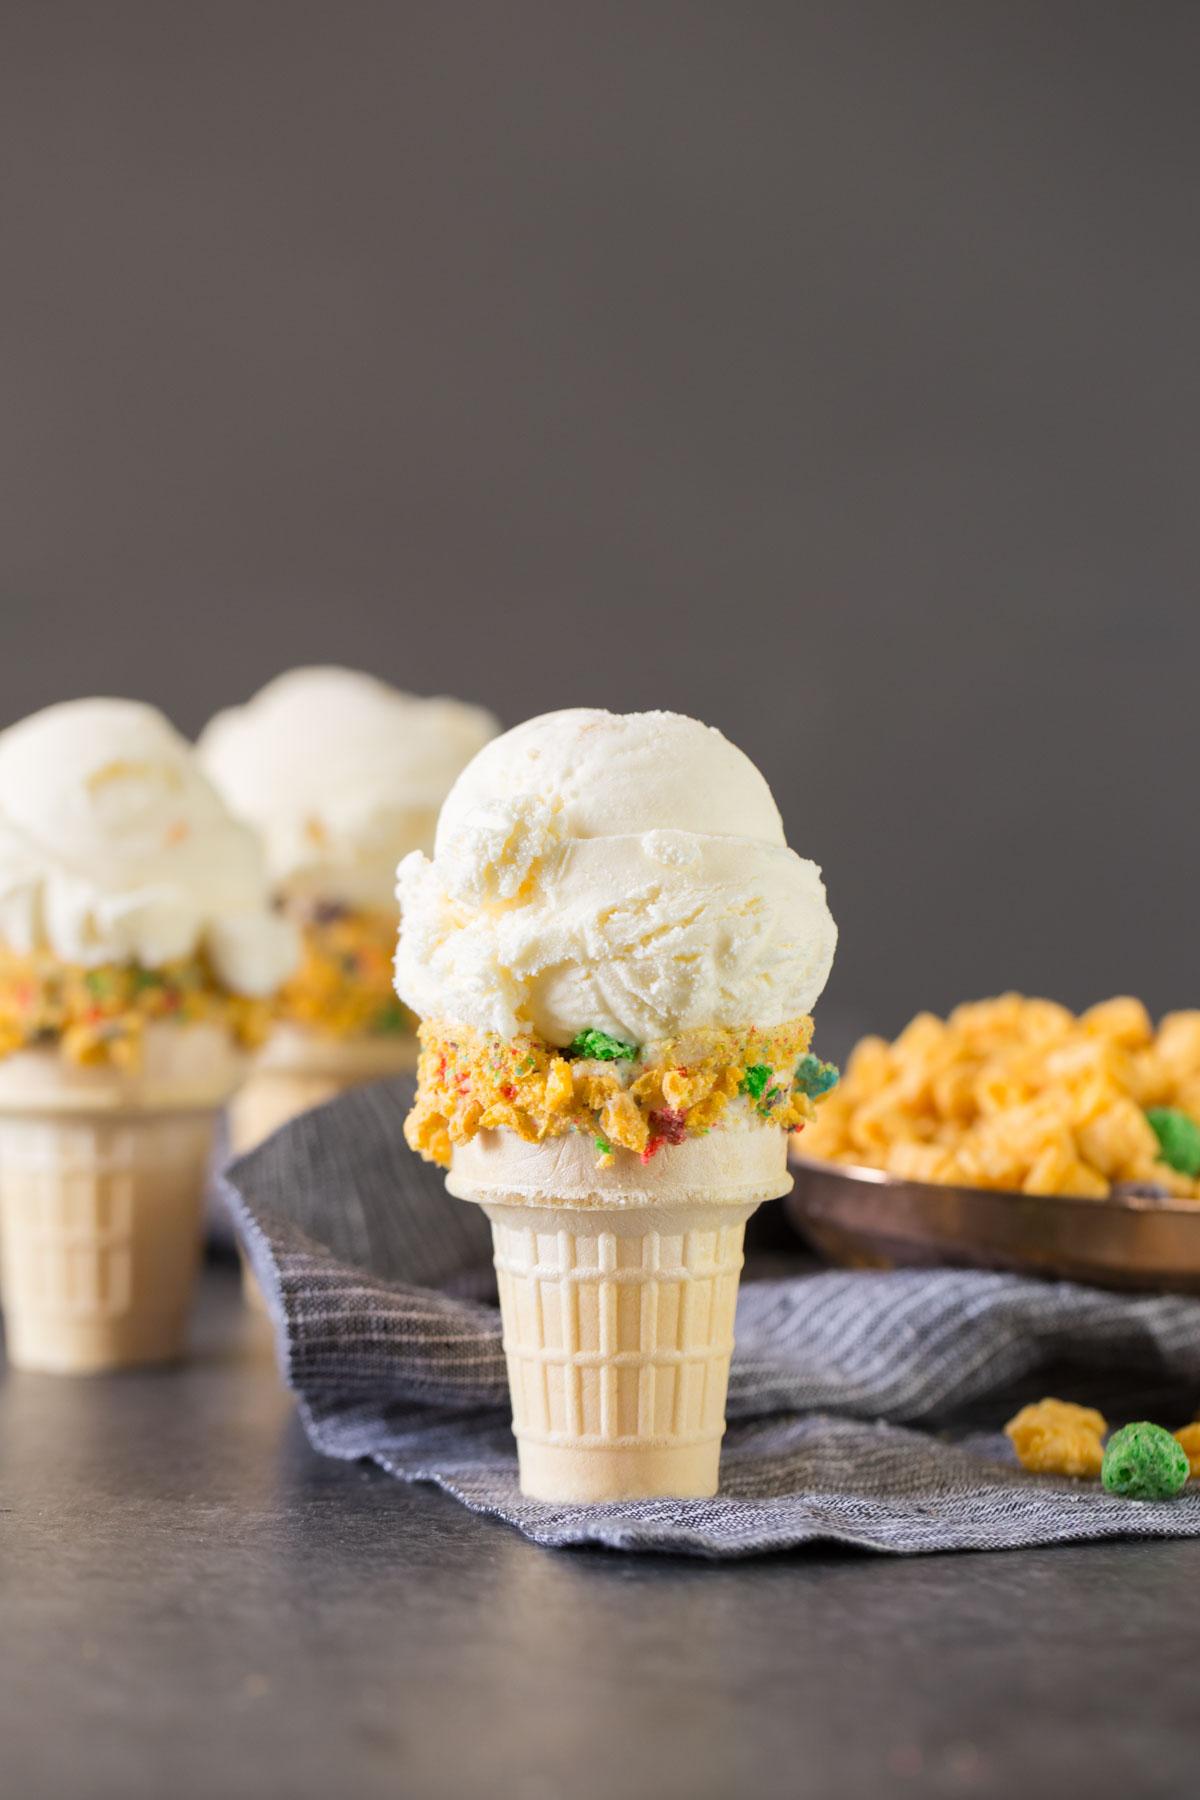 Homemade Cereal Milk Ice Cream in a cone.